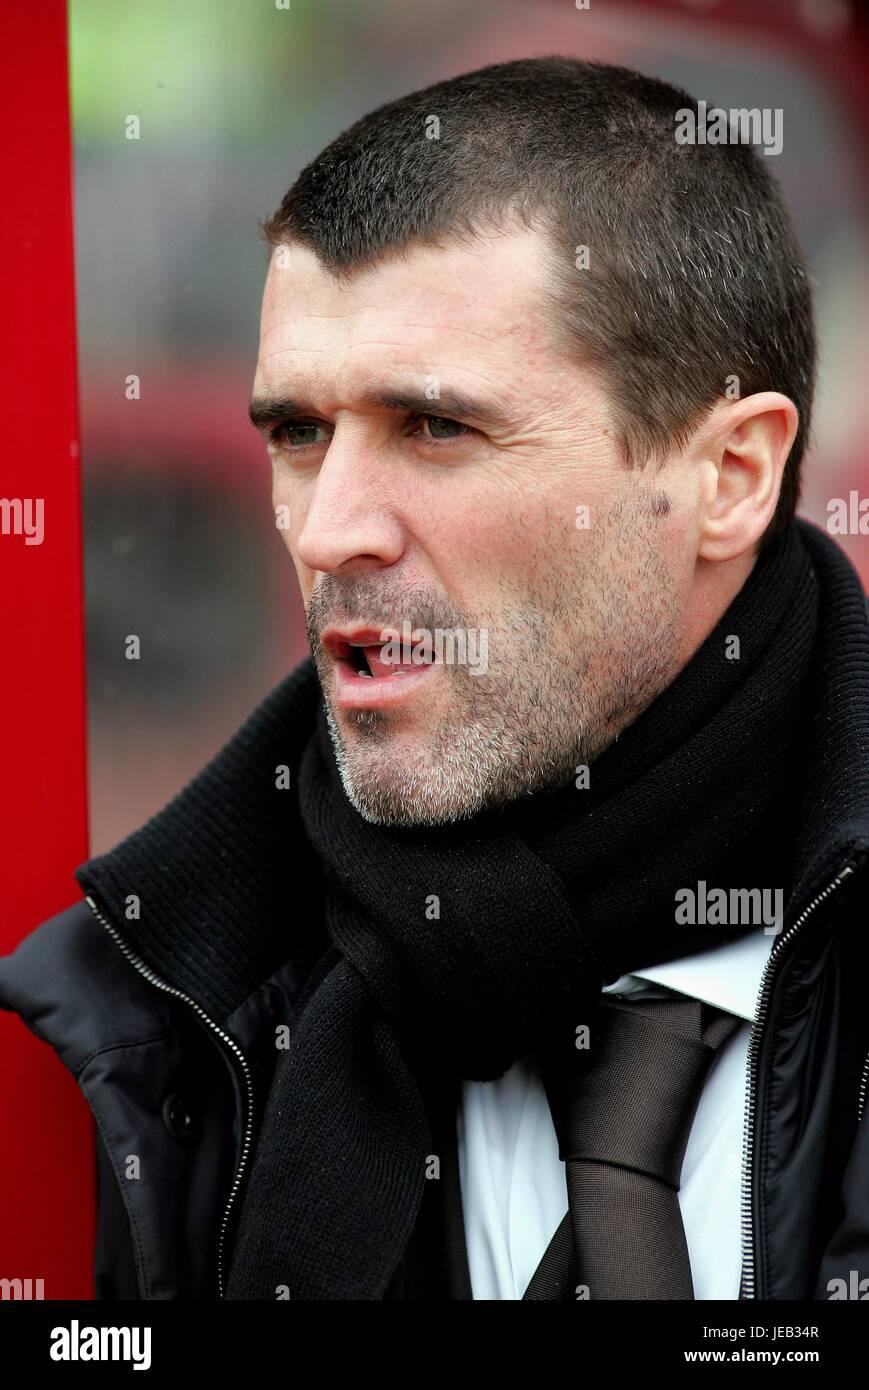 ROY KEANE SUNDERLAND FC MANAGER OAKWELL BARNSLEY ENGLAND 10 March